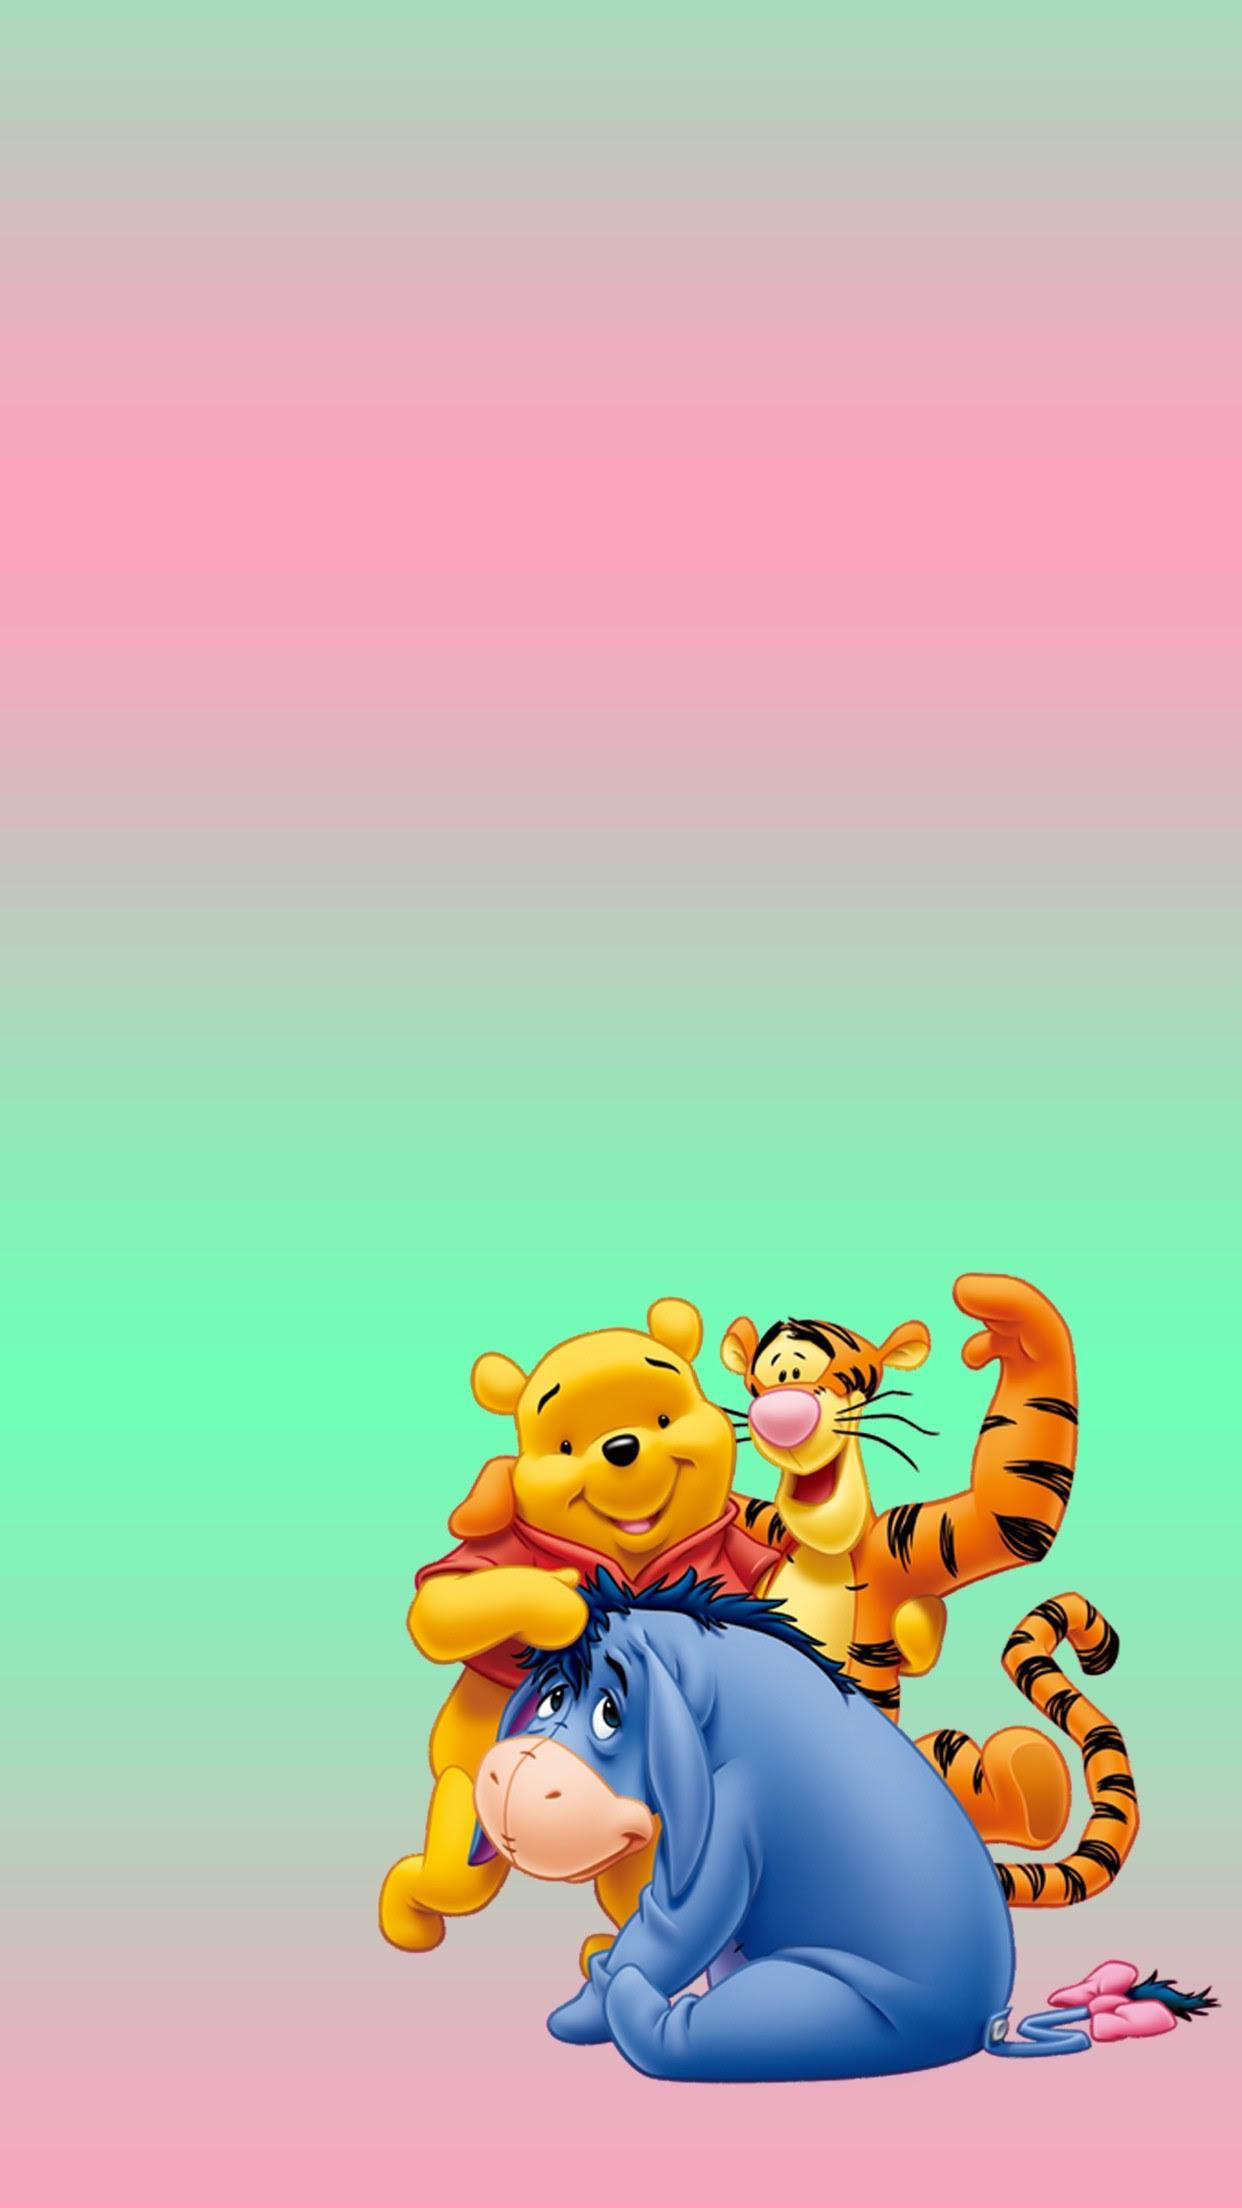 Unduh 800+ Wallpaper Iphone Winnie The Pooh HD Paling Keren